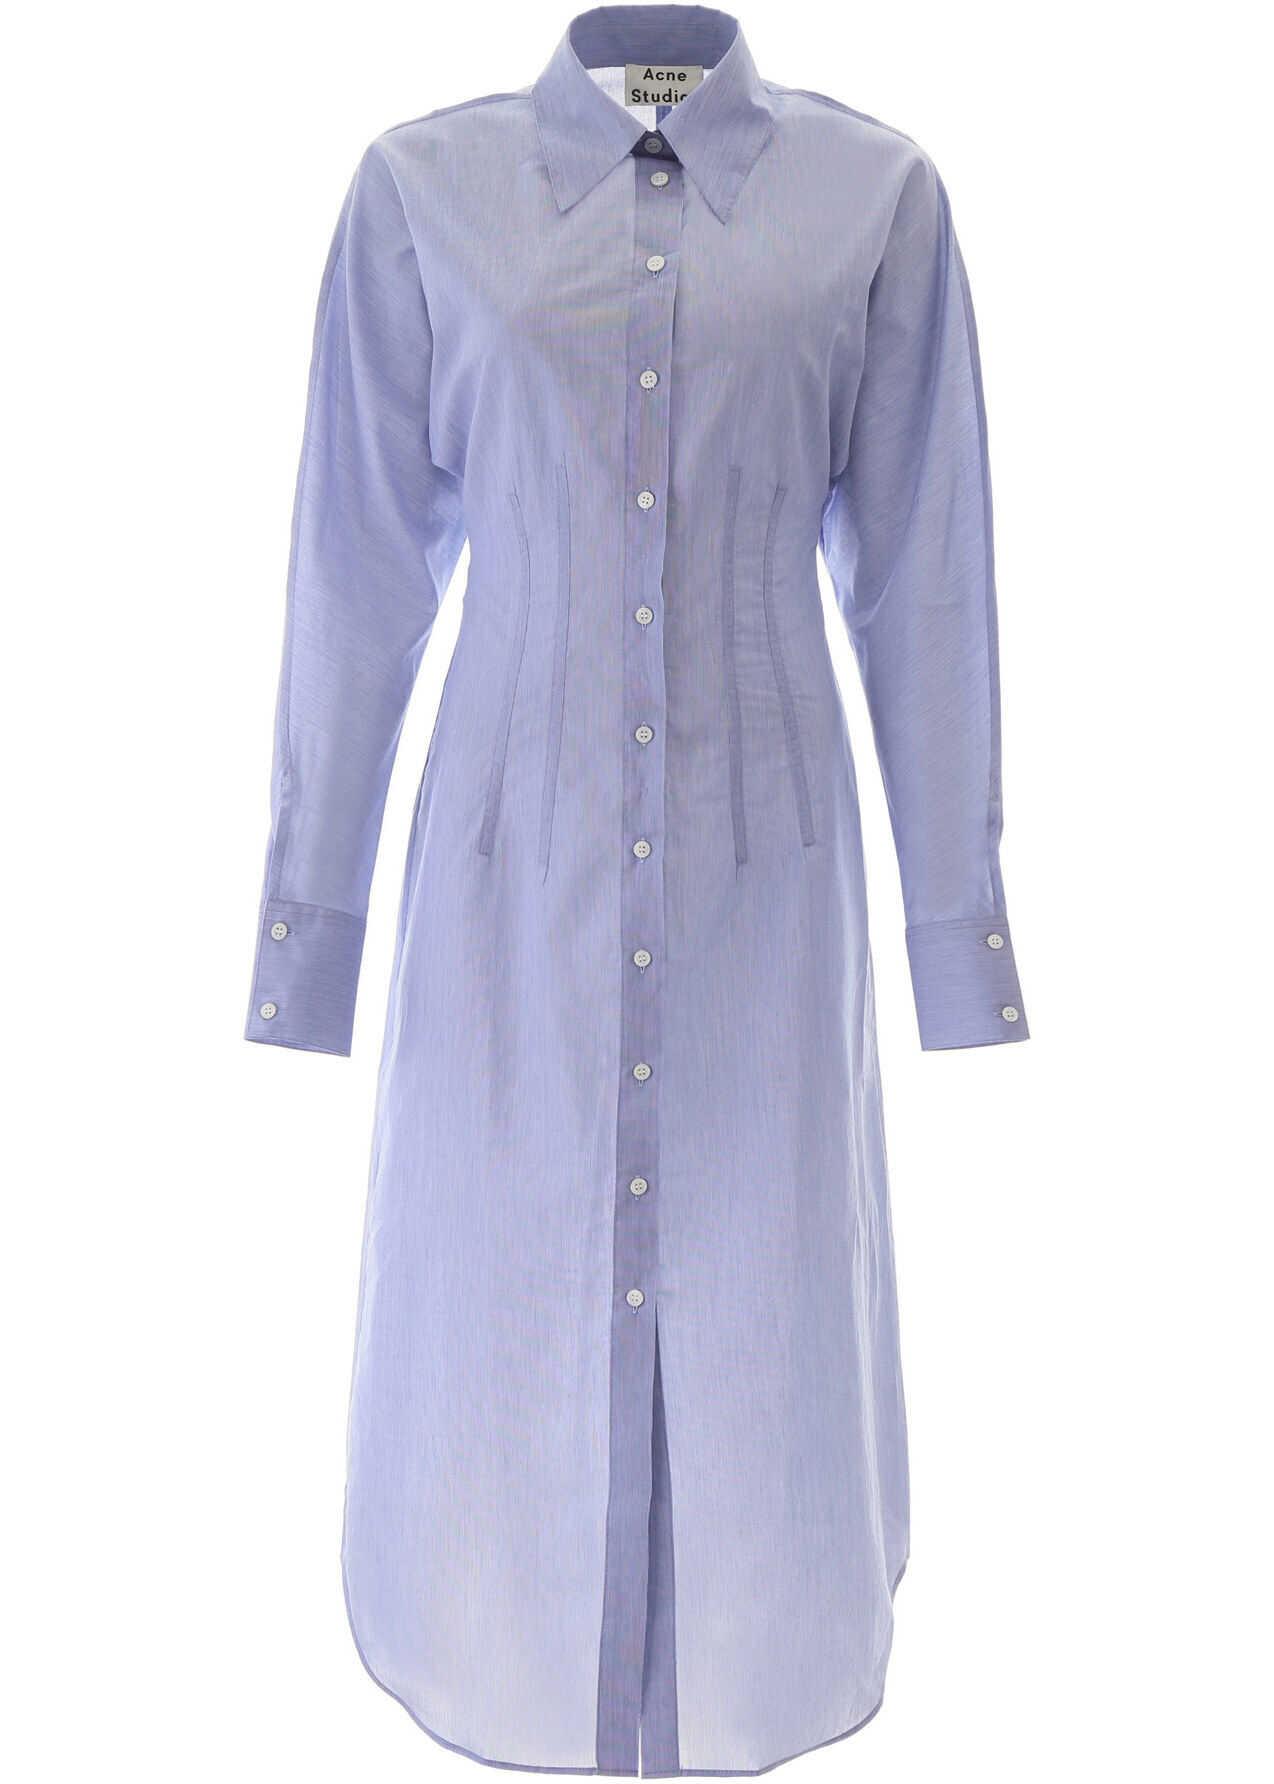 Acne Studios Midi Shirt Dress POWDER BLUE